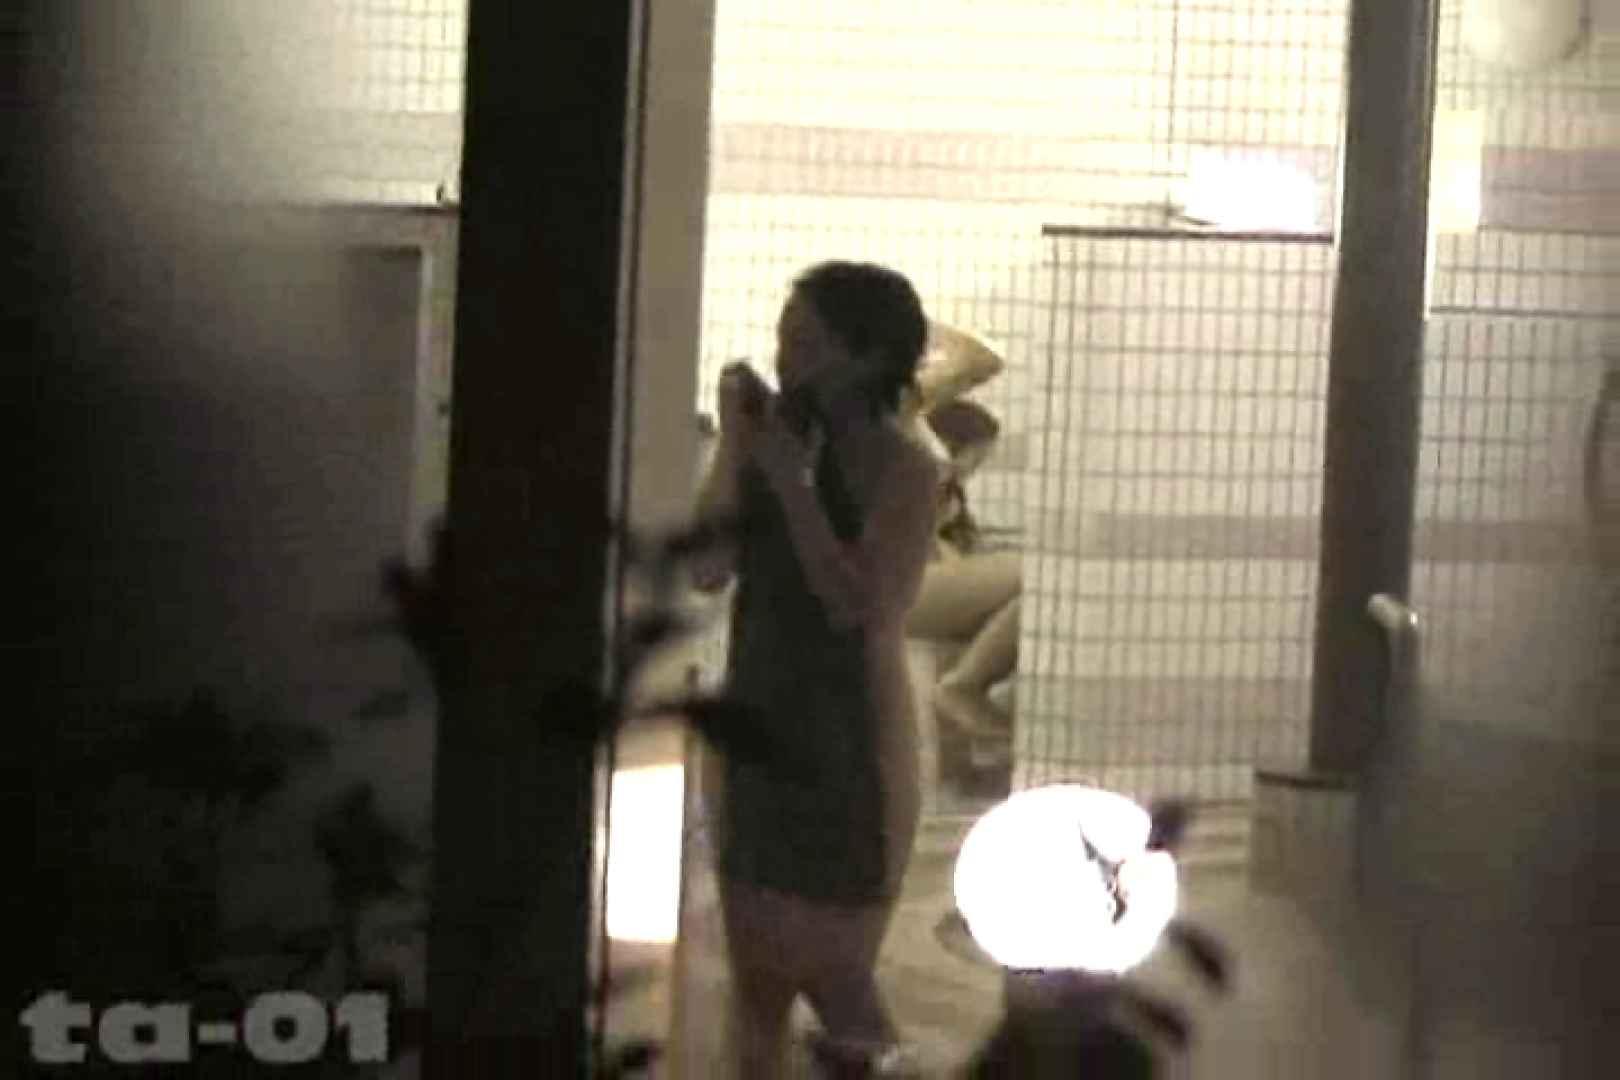 合宿ホテル女風呂盗撮高画質版 Vol.01 盗撮大放出 ワレメ無修正動画無料 59連発 35